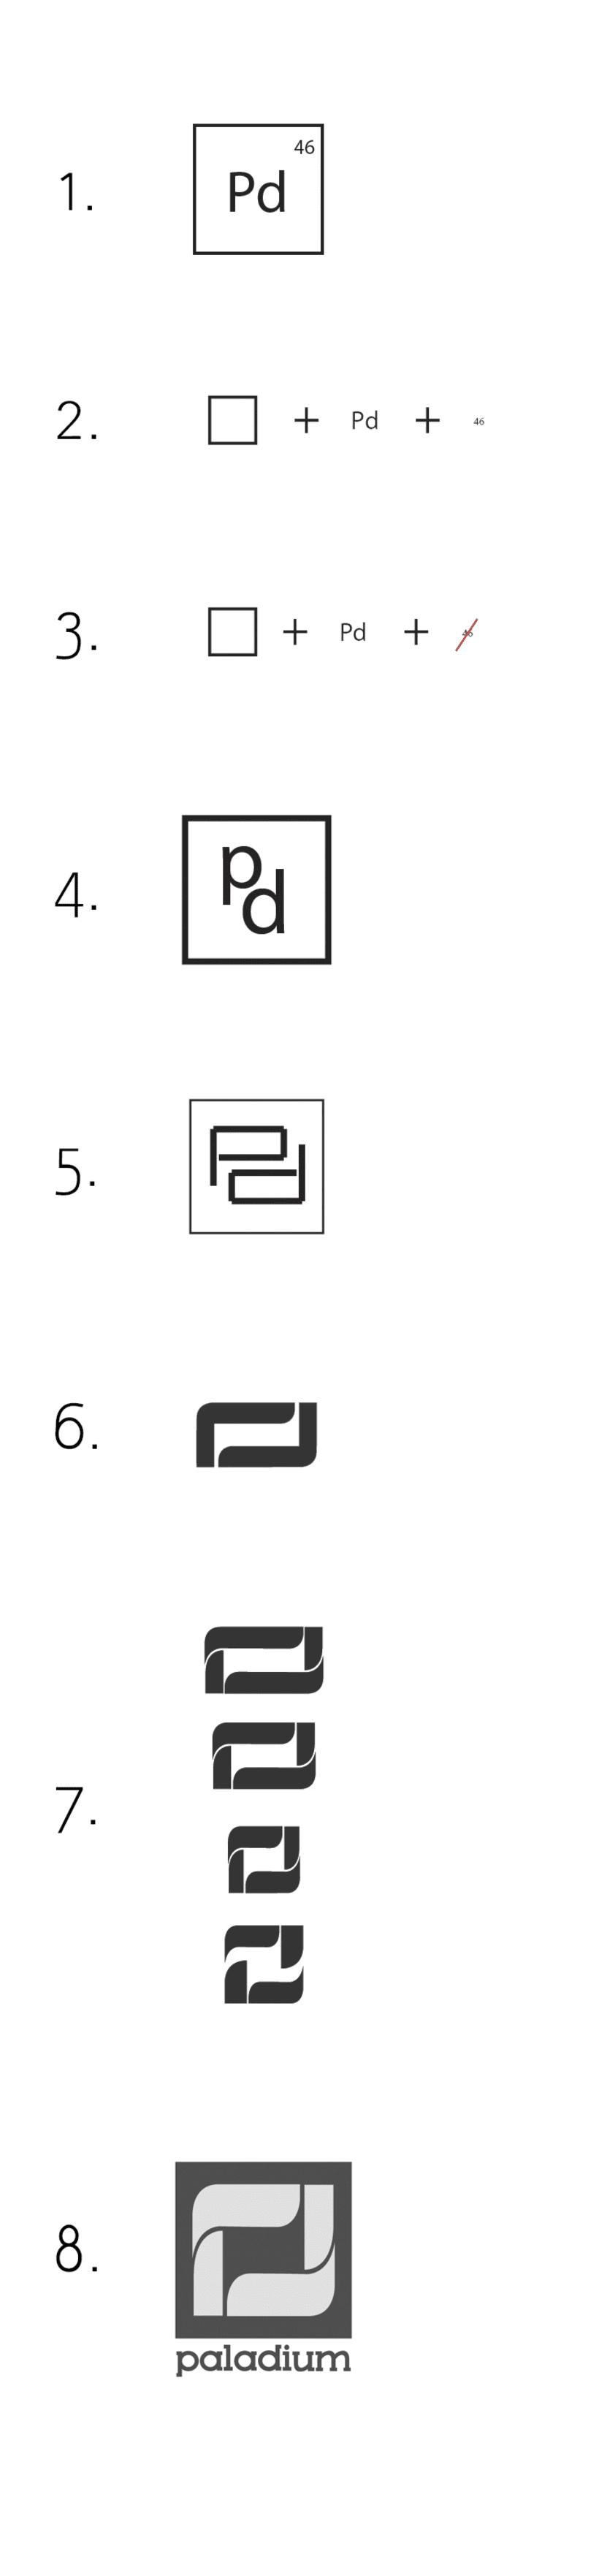 Logo para Paladium 0